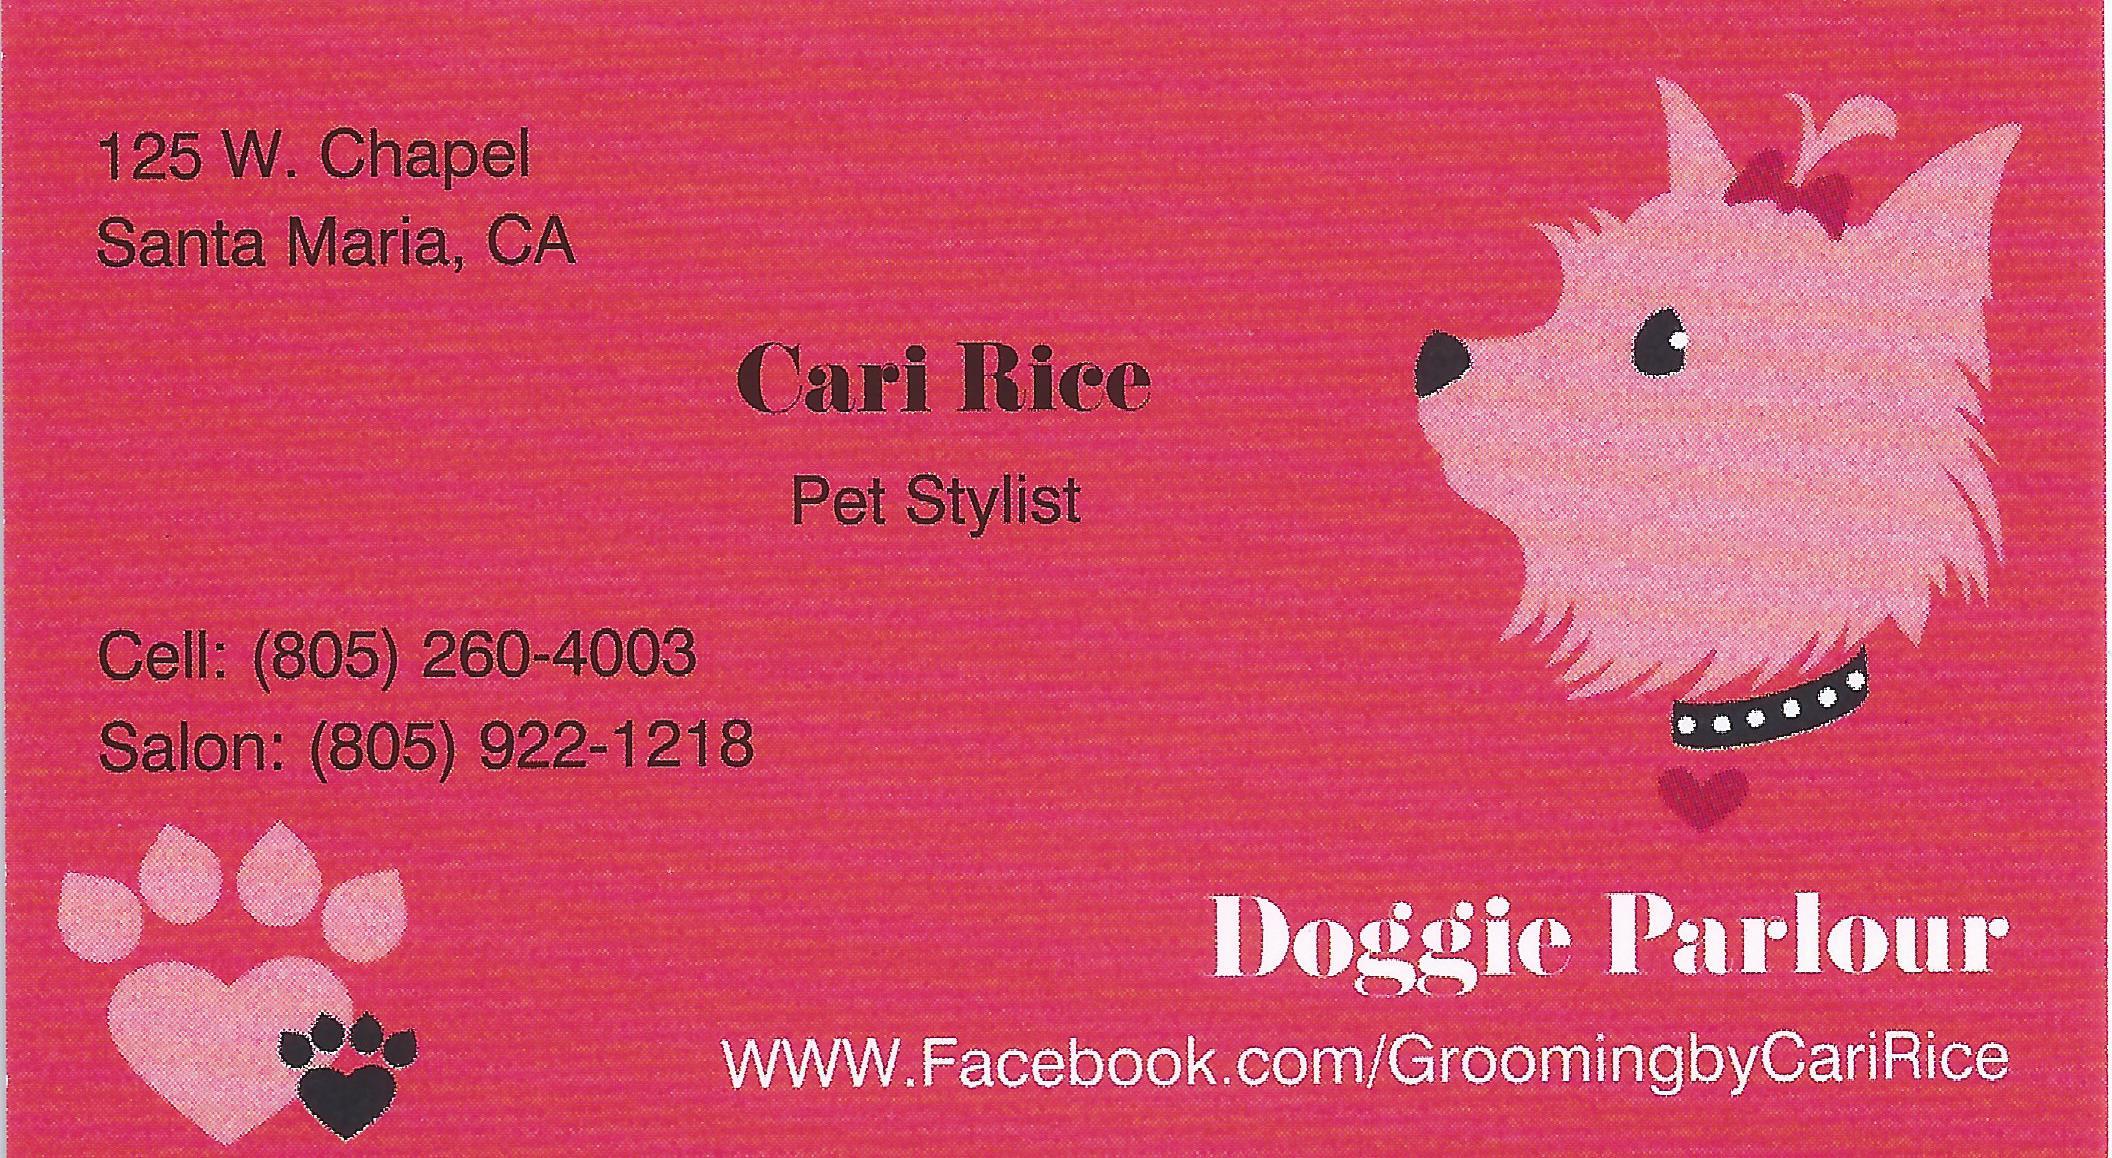 Cari Rice - Pet Stylist